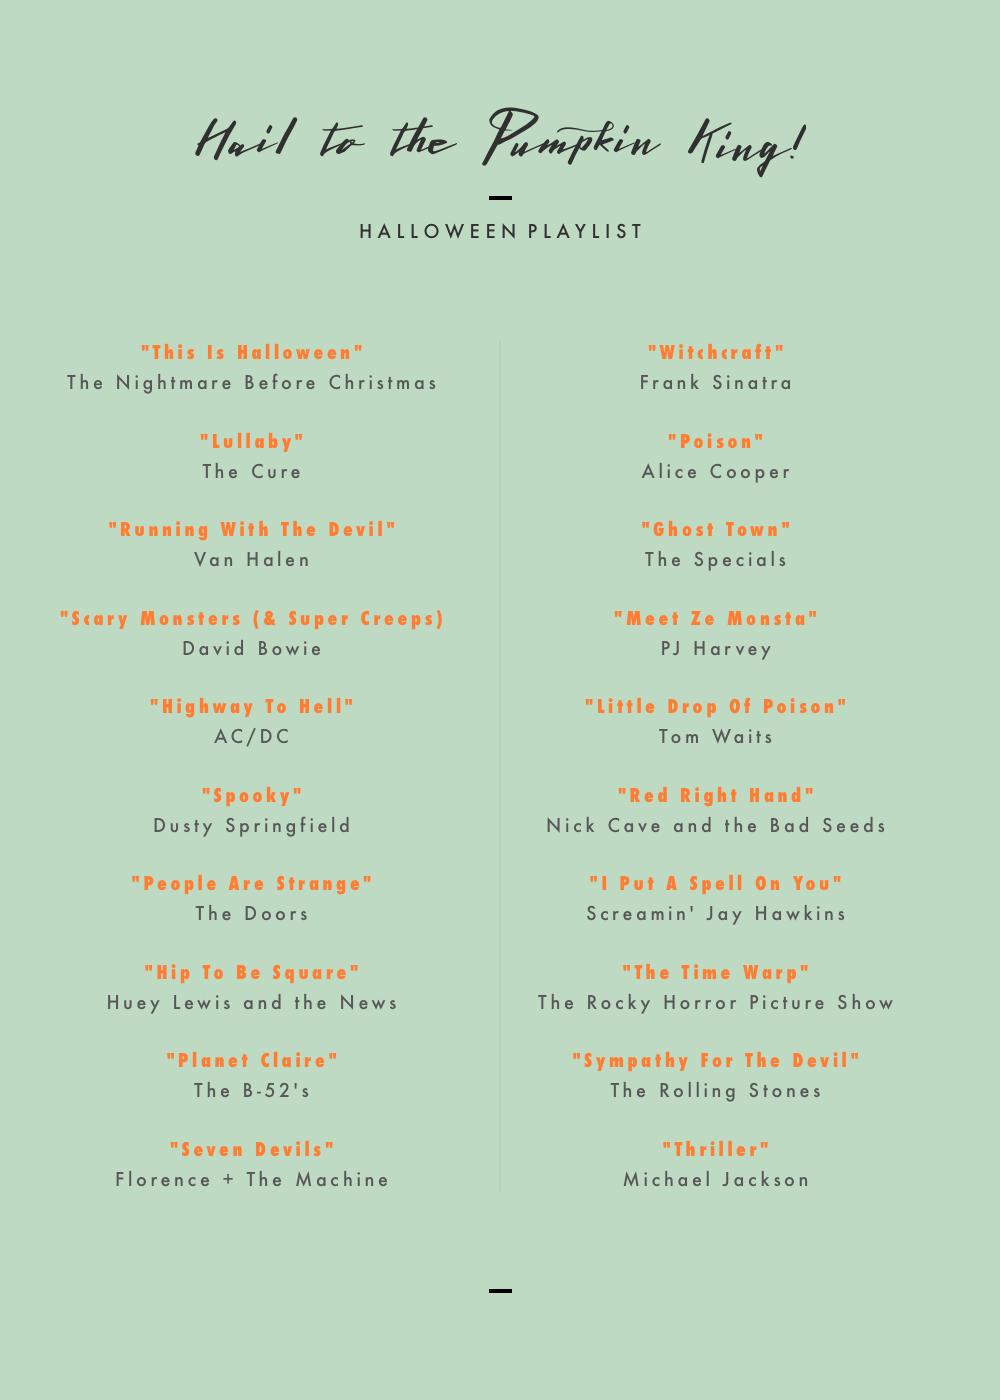 HalloweenTracklist.jpg